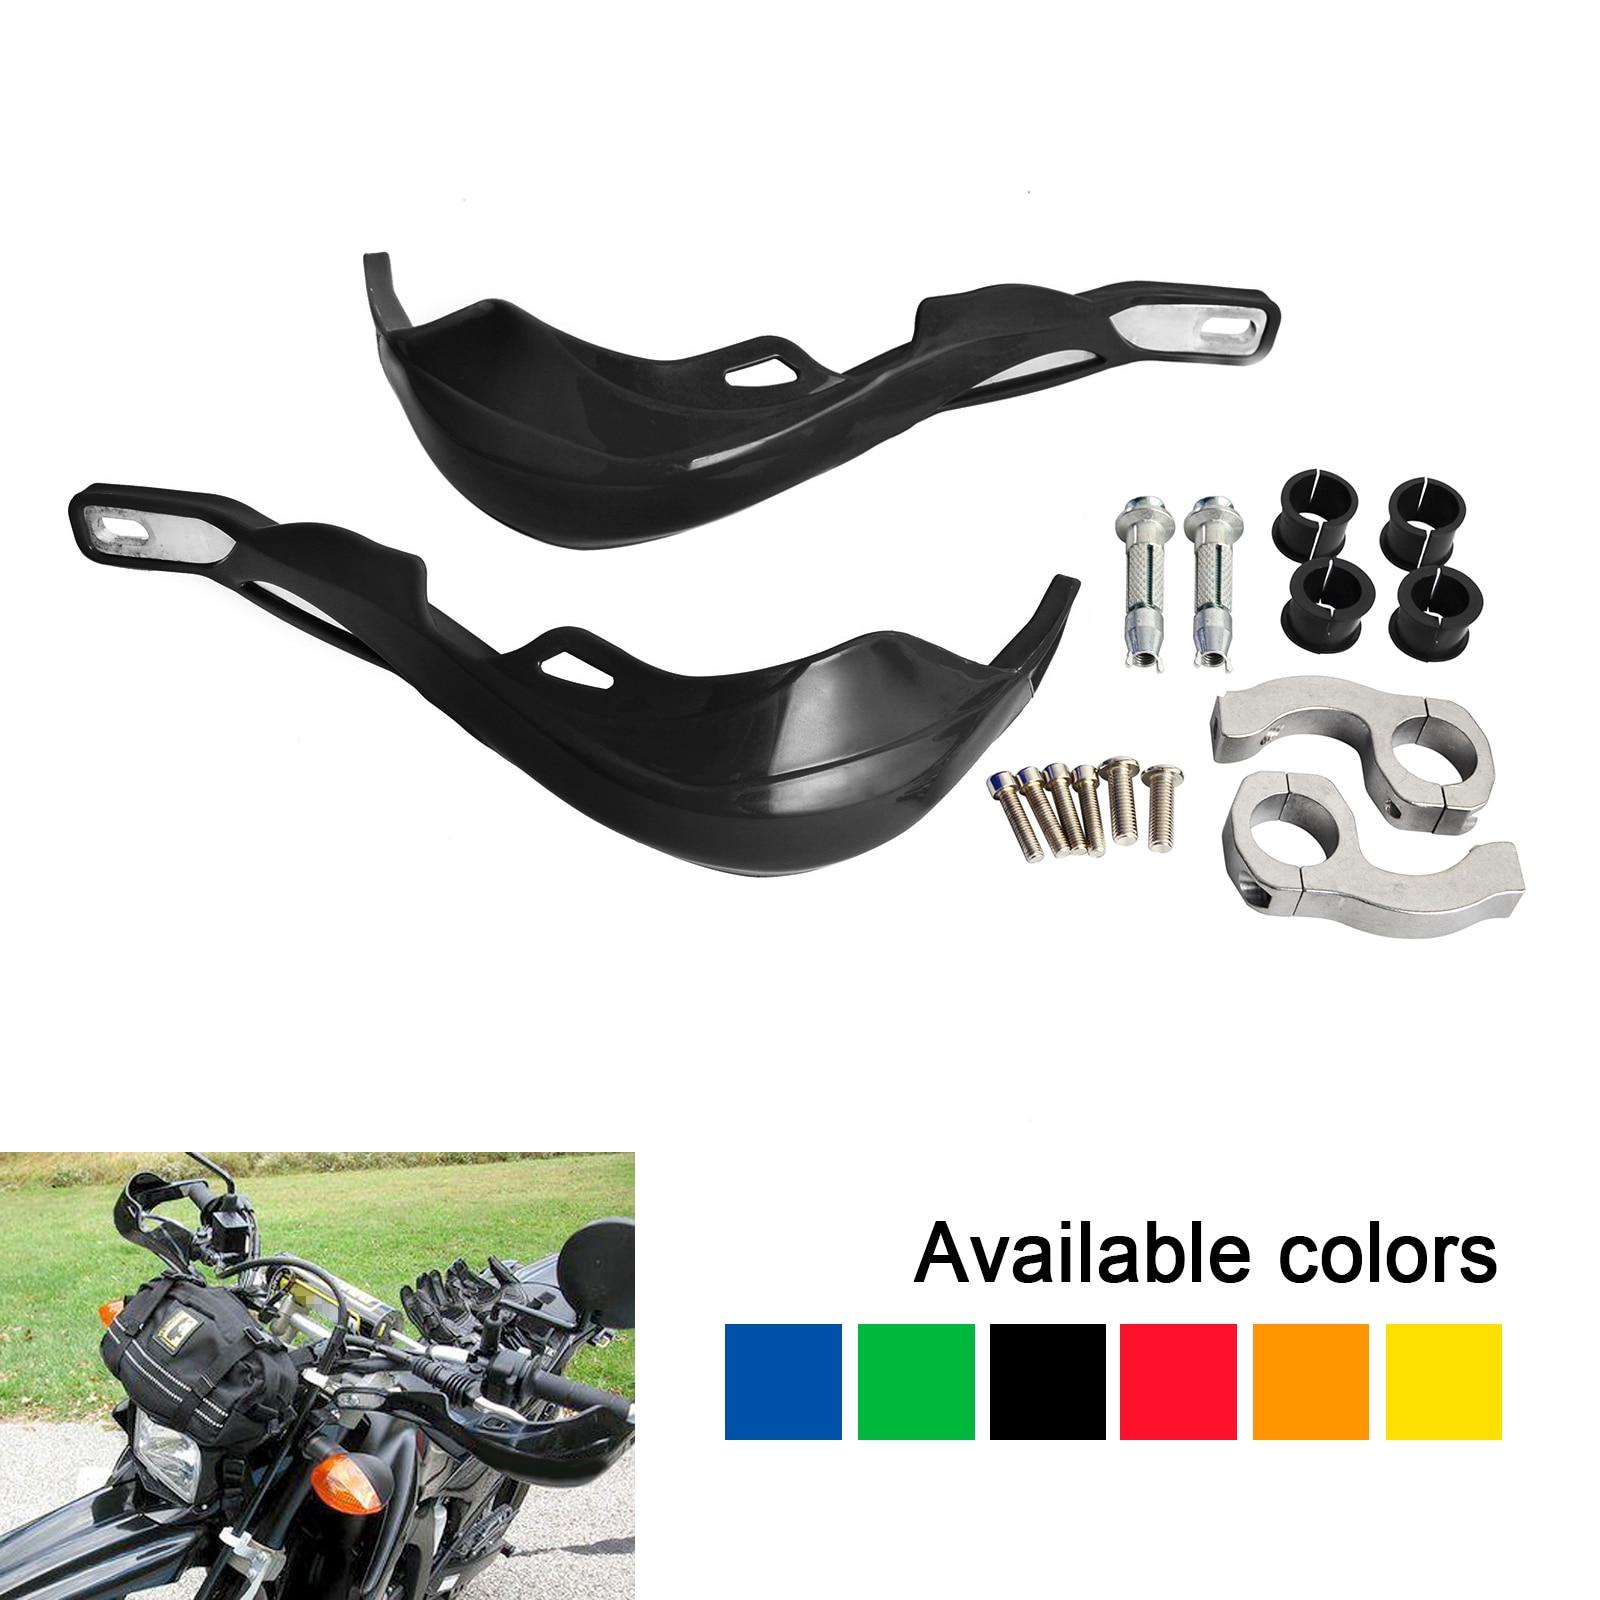 Black GOOFIT Handlebar Hand Brush Guards Protector Handguards for Honda Kawasaki Yamaha Suzuki Motocross Motorcycle Off-road Pit Dirt Bike ATV